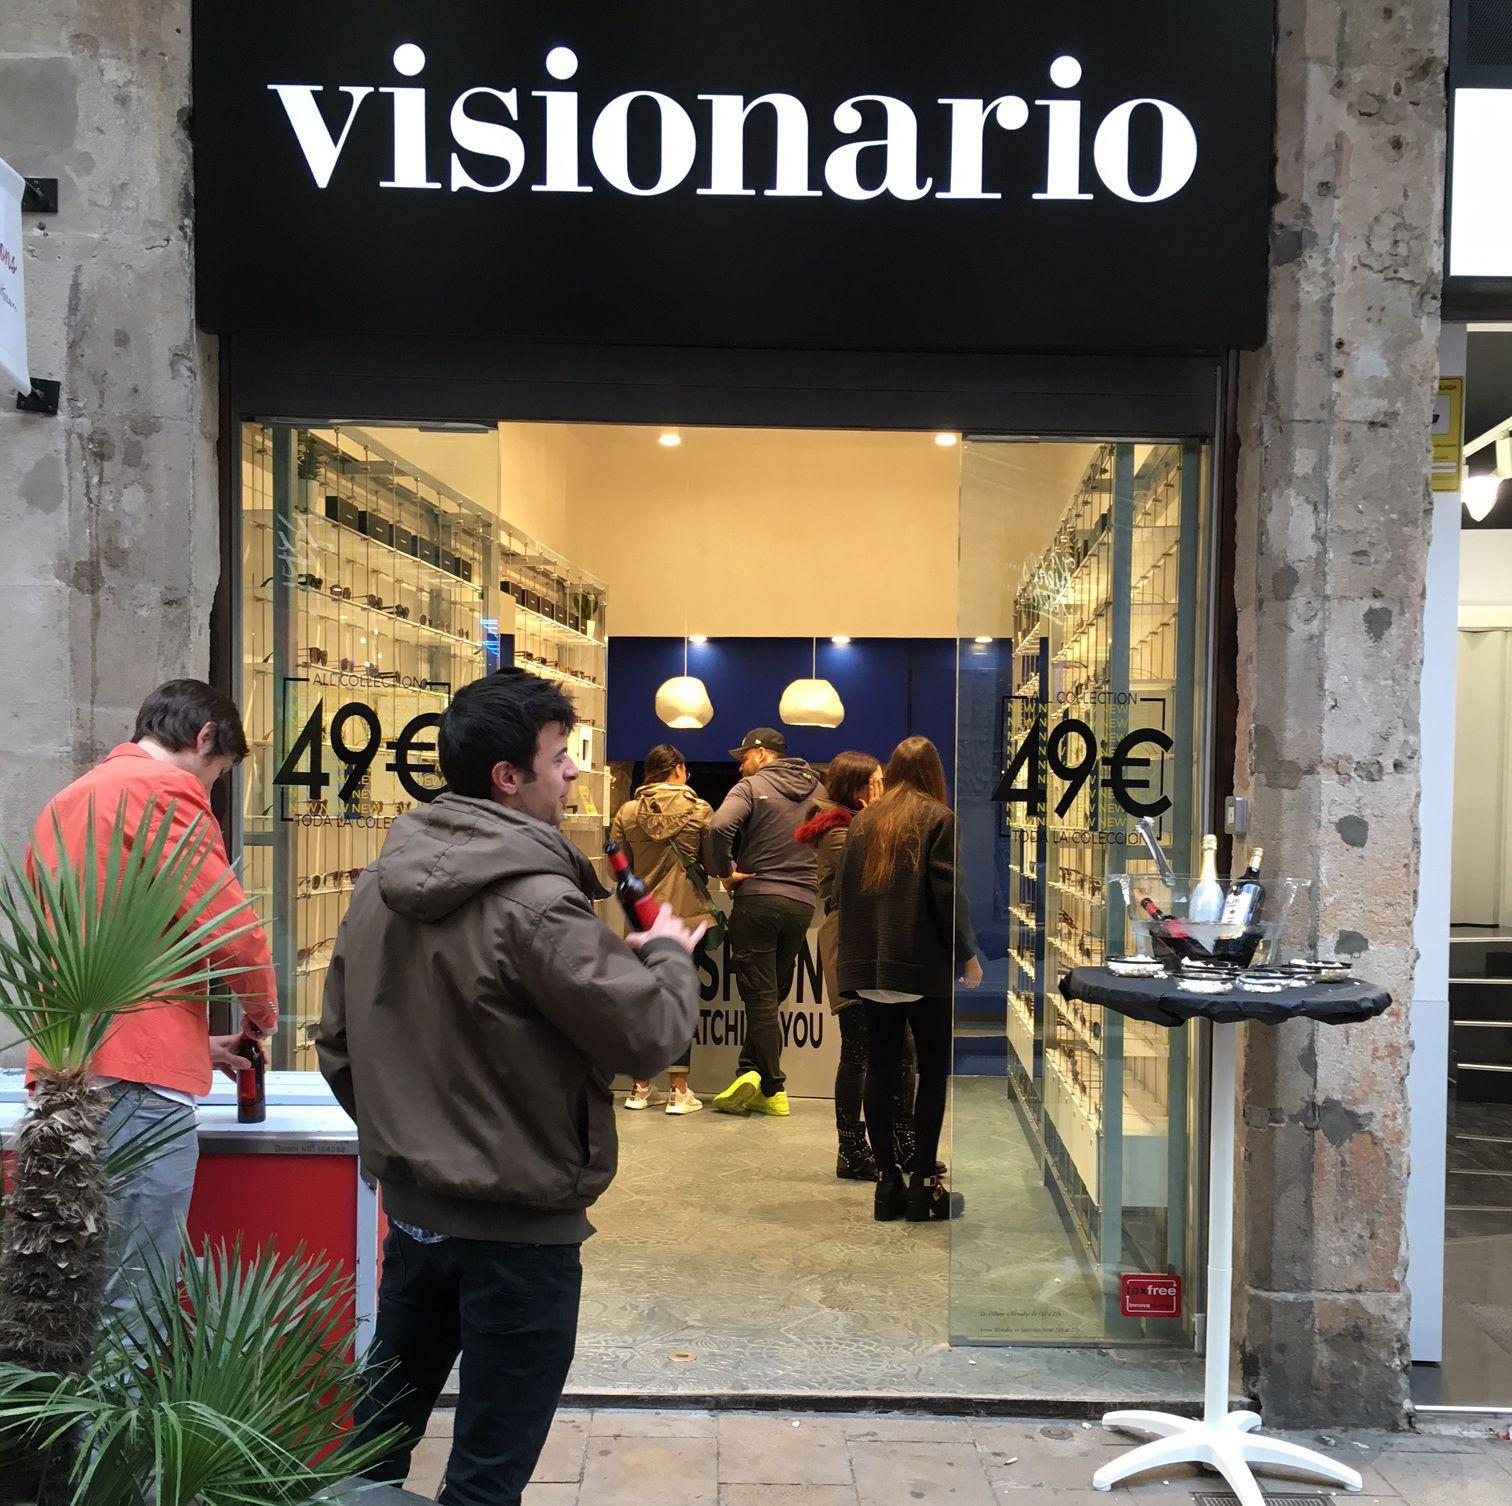 https://whiterabbit.es/wp-content/uploads/2017/03/visionario-argenteria.jpg